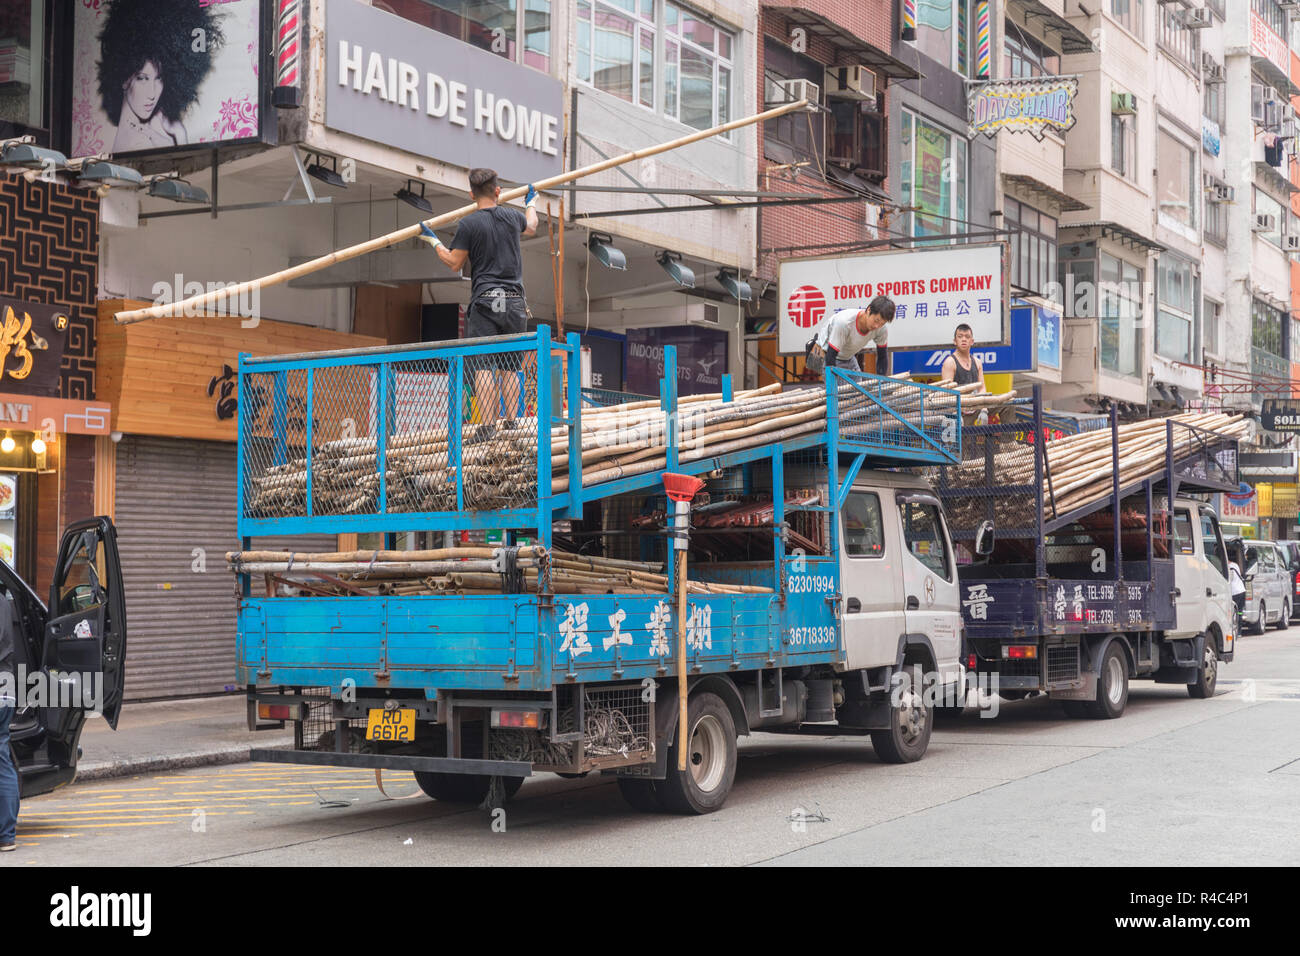 KOWLOON, HONG KONG - APRIL 21, 2017: Workers Unloading Trucks With Bamboo Scaffoldings at Construction Site at Mong Kok in Kowloon, Hong Kong. - Stock Image